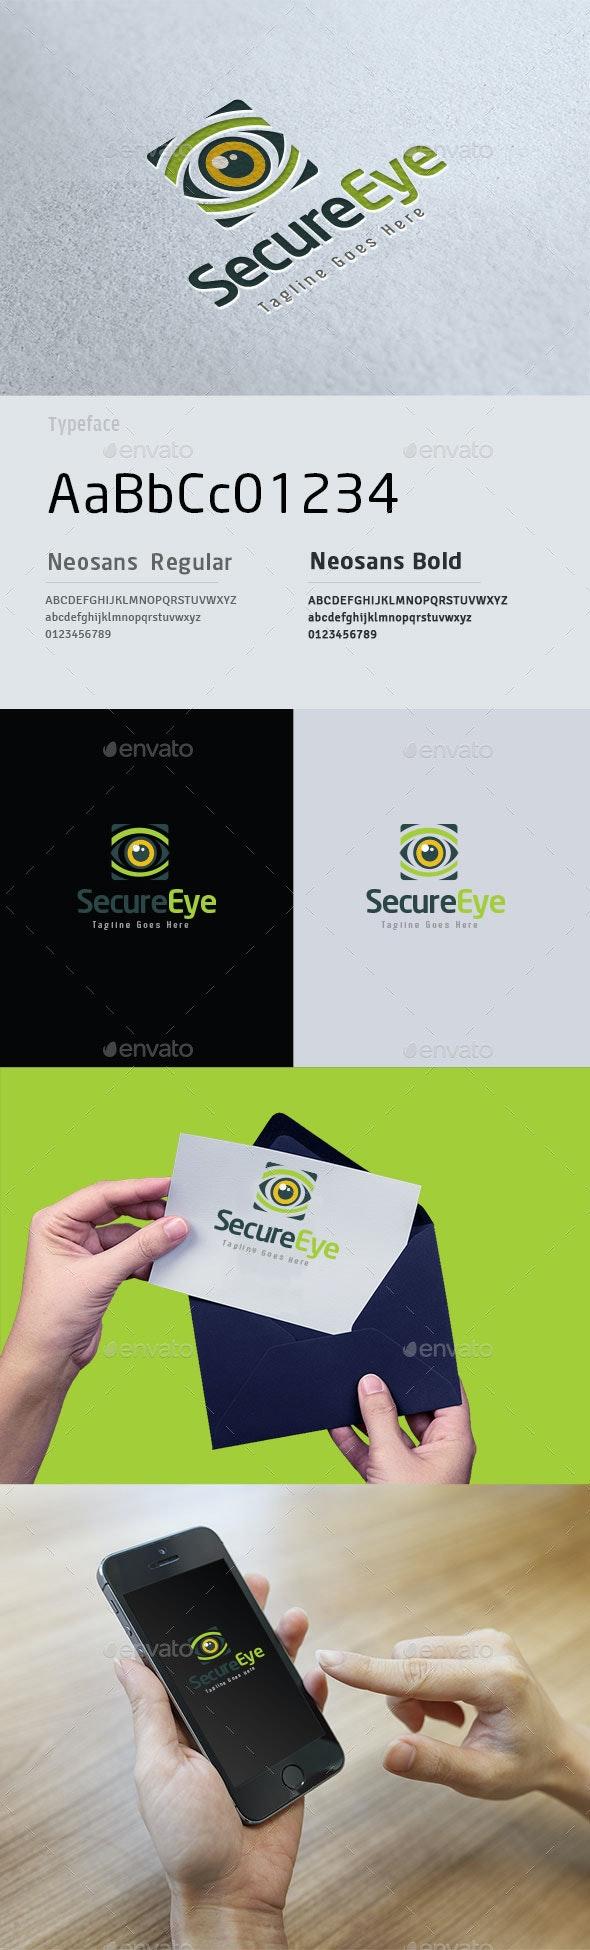 Secure Eye App Logo - Symbols Logo Templates